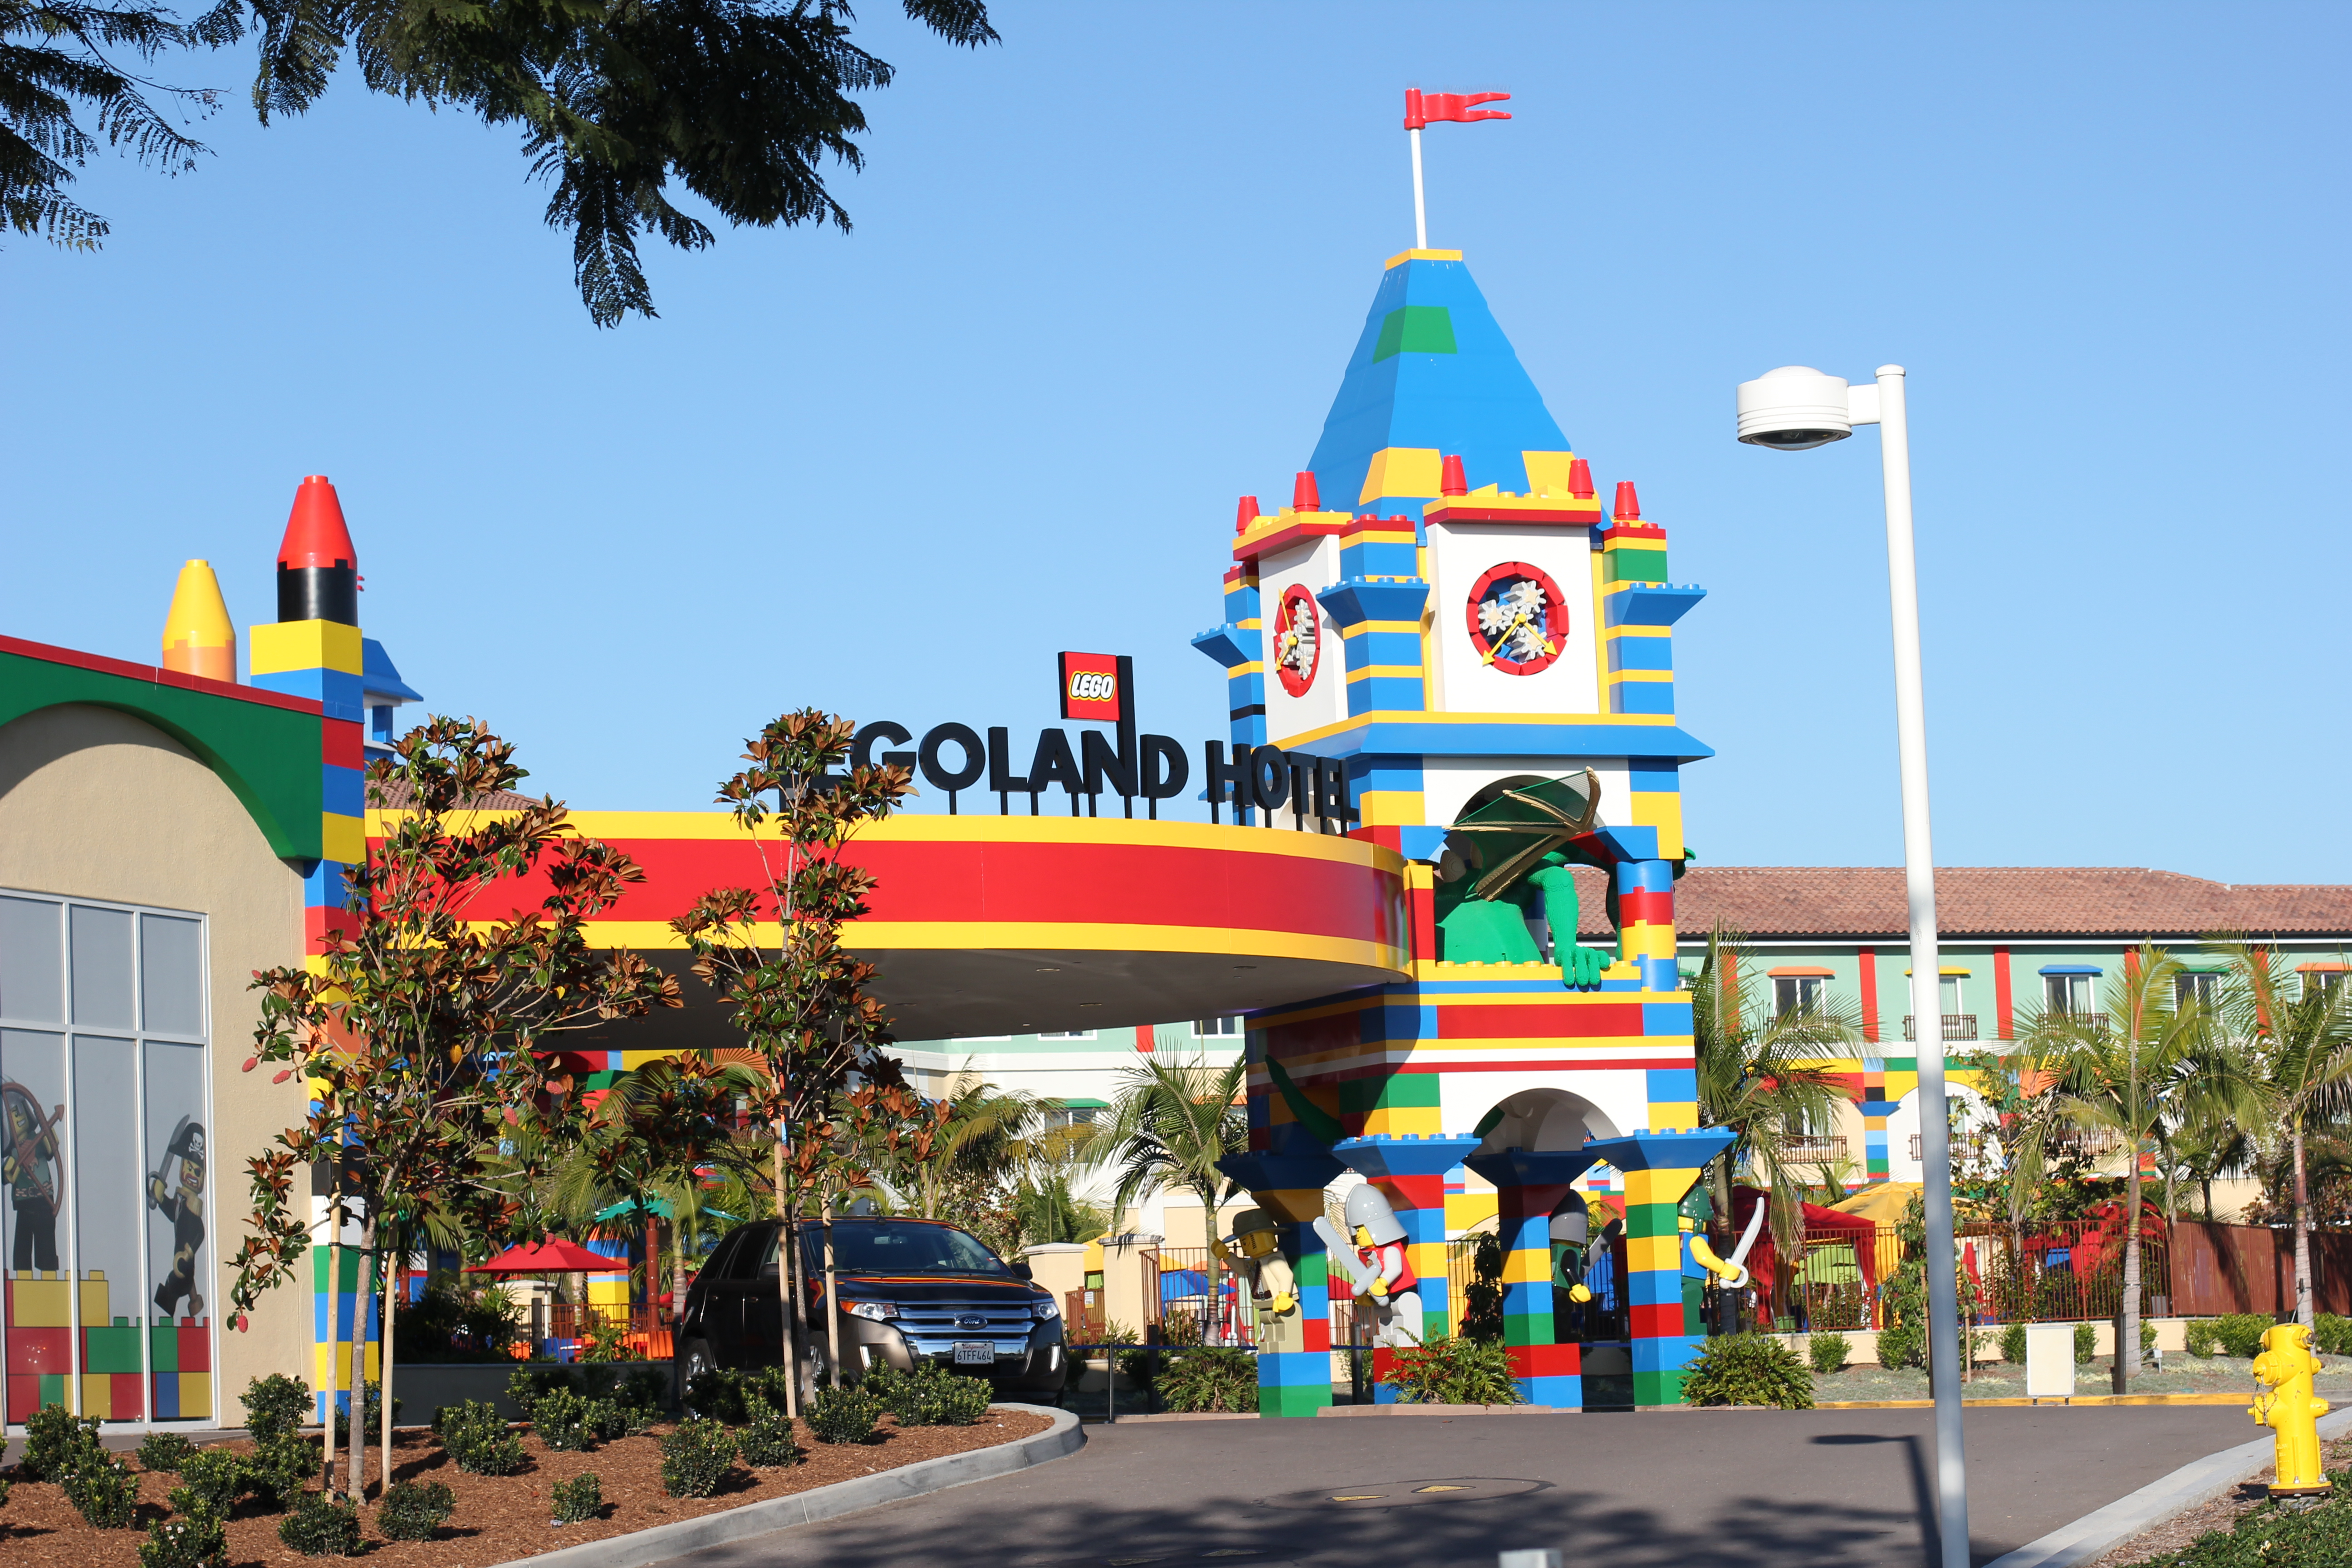 Legoland hotel carlsbad for Hotel california